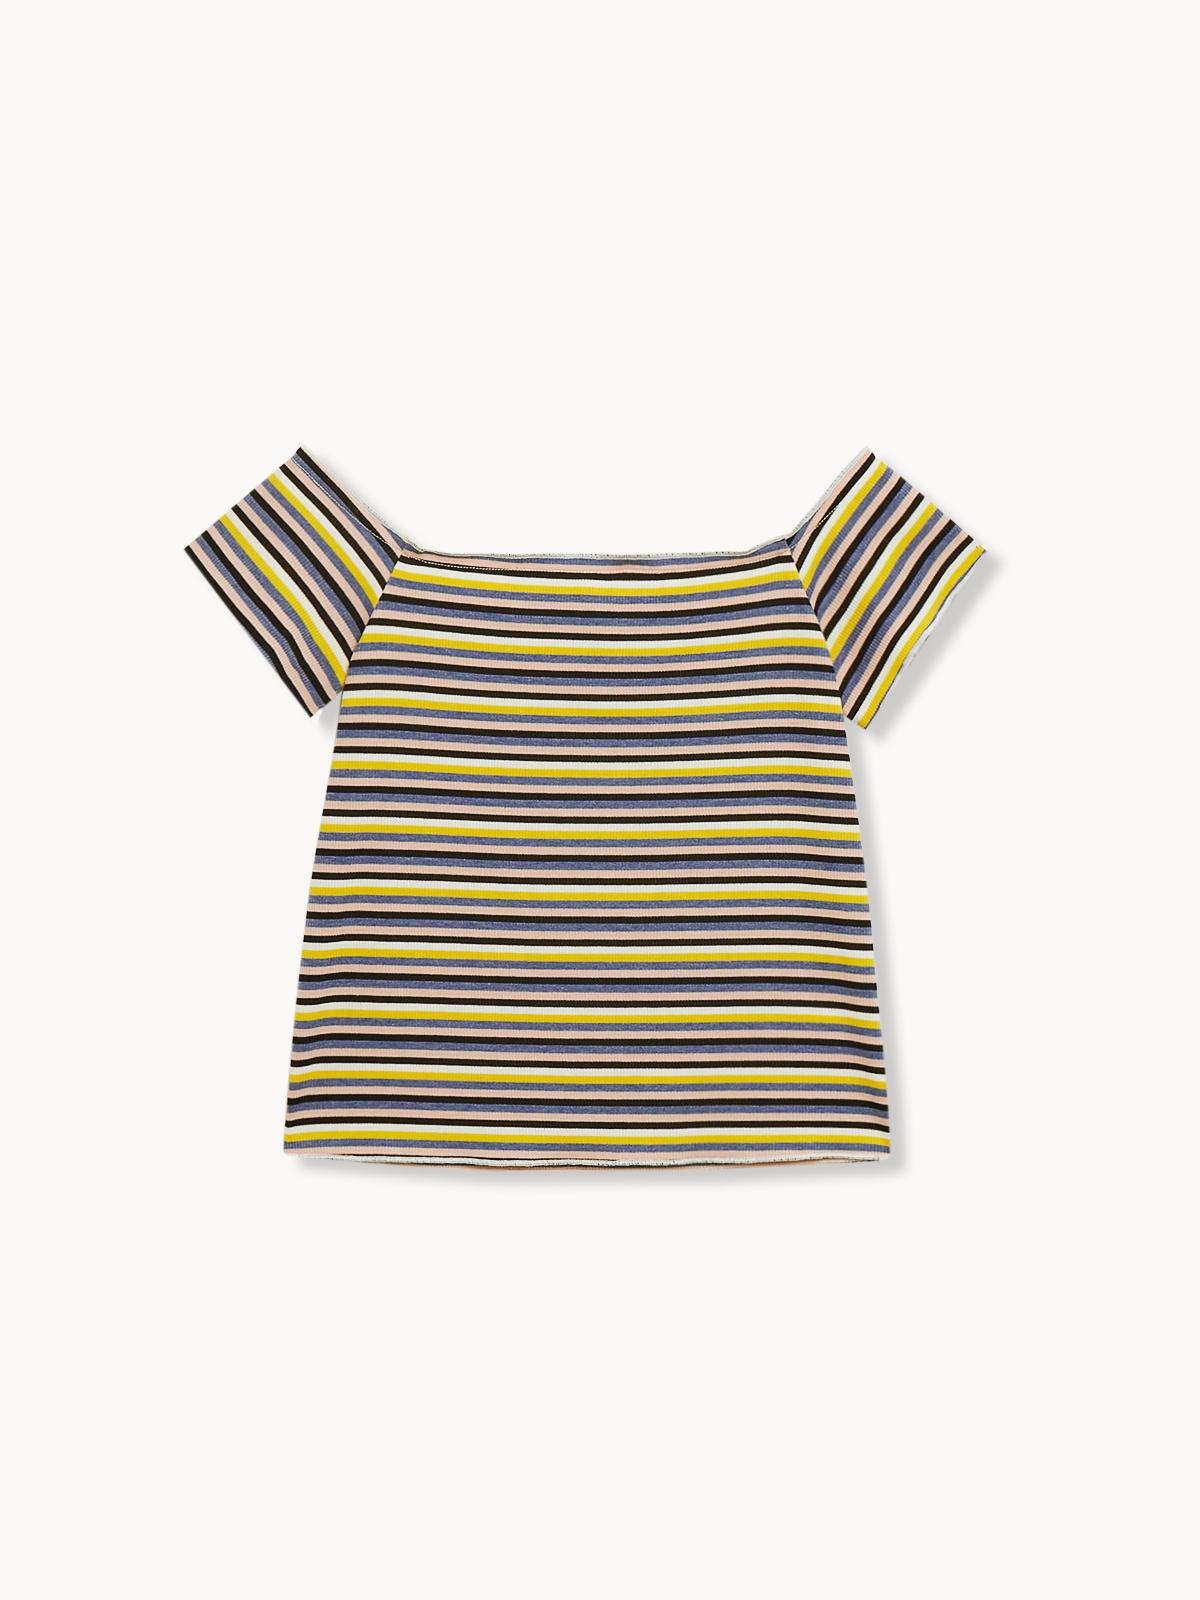 Stripe Off Shoulder Top Yellow